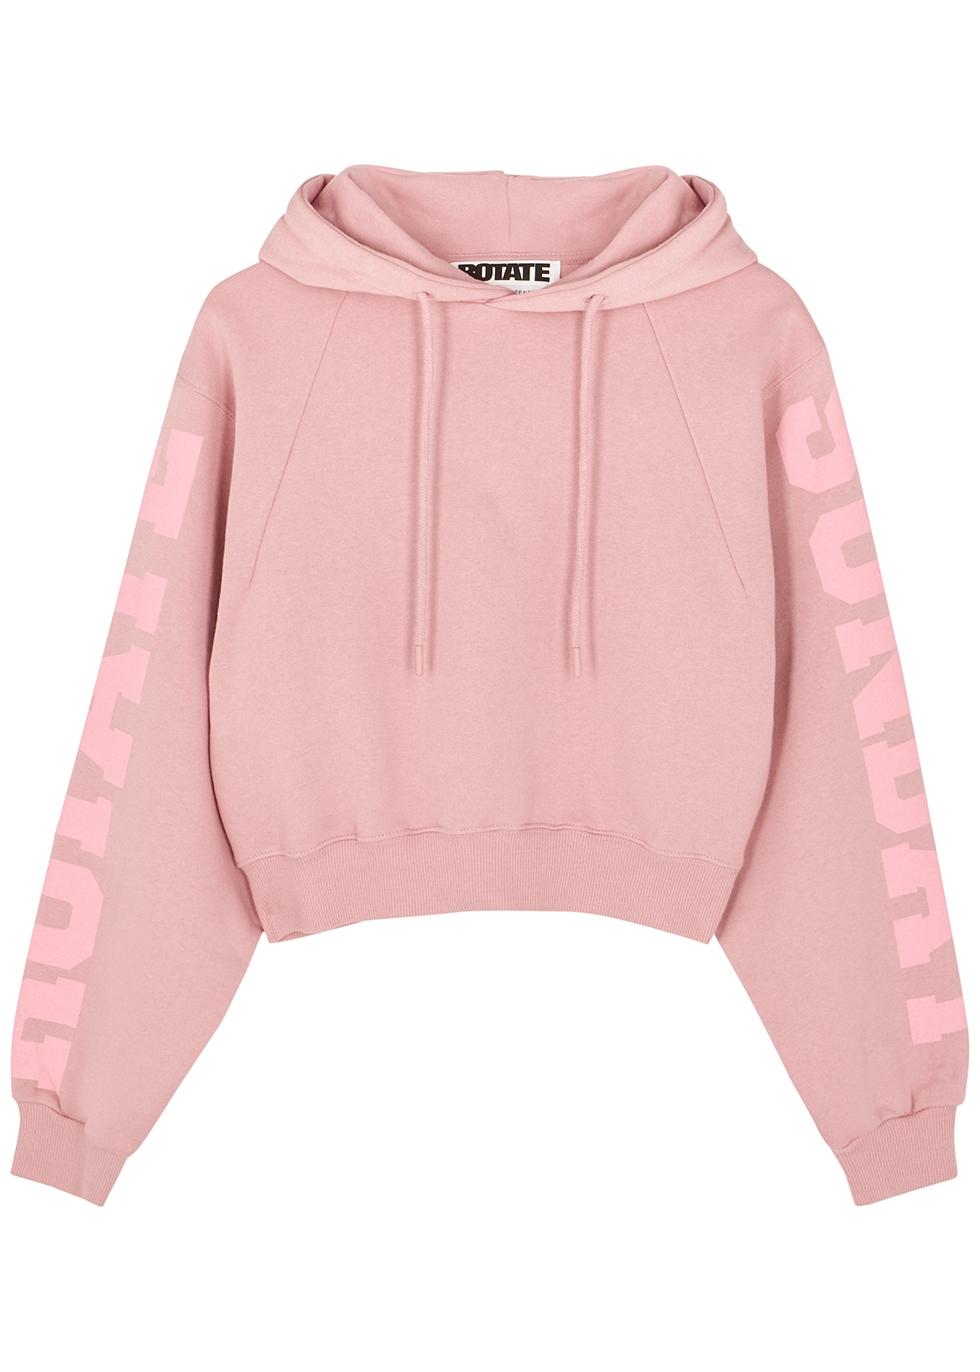 Viola pink hooded cotton sweatshirt